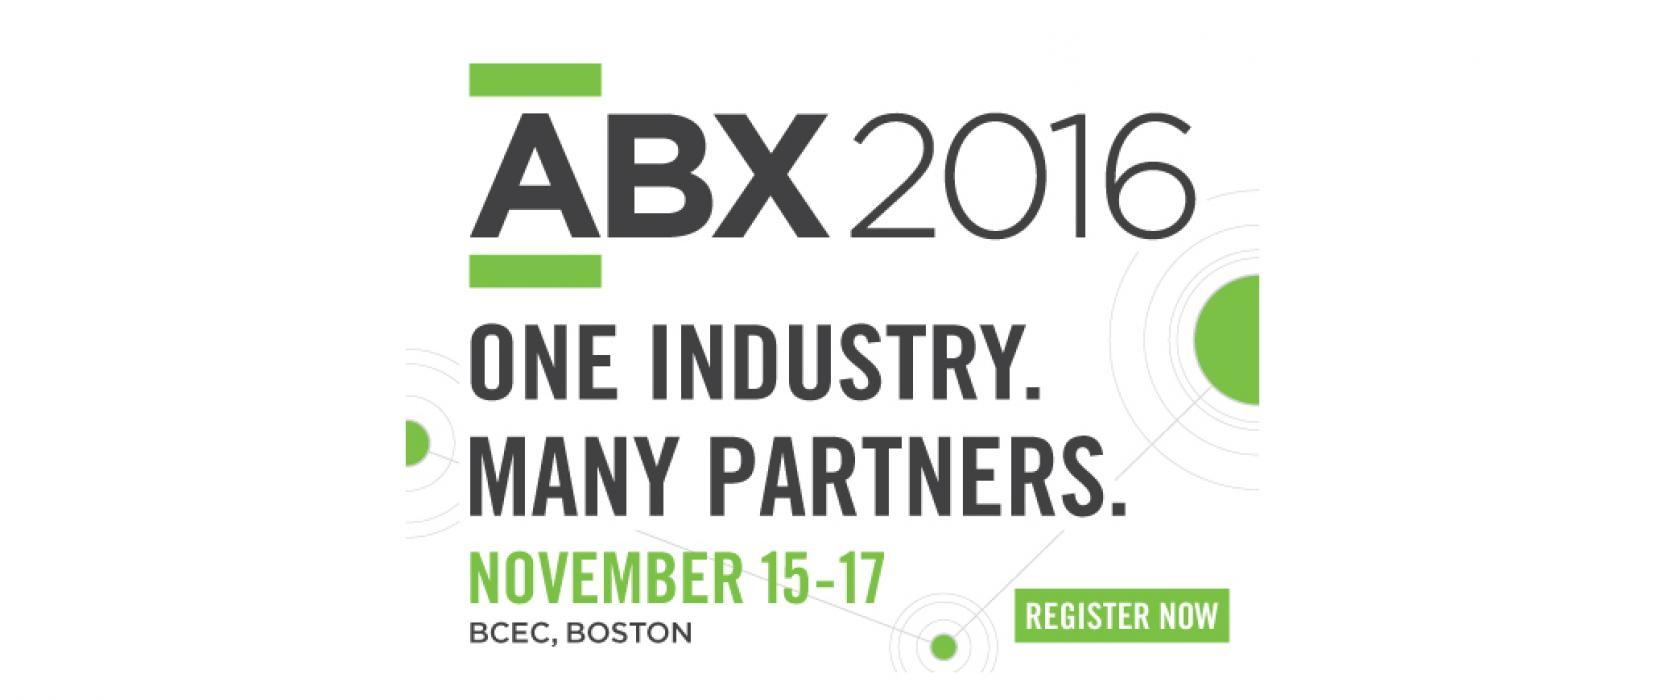 Don't Miss ArchitectureBoston Expo at the Boston Convention & Exhibition Center on November 15-17